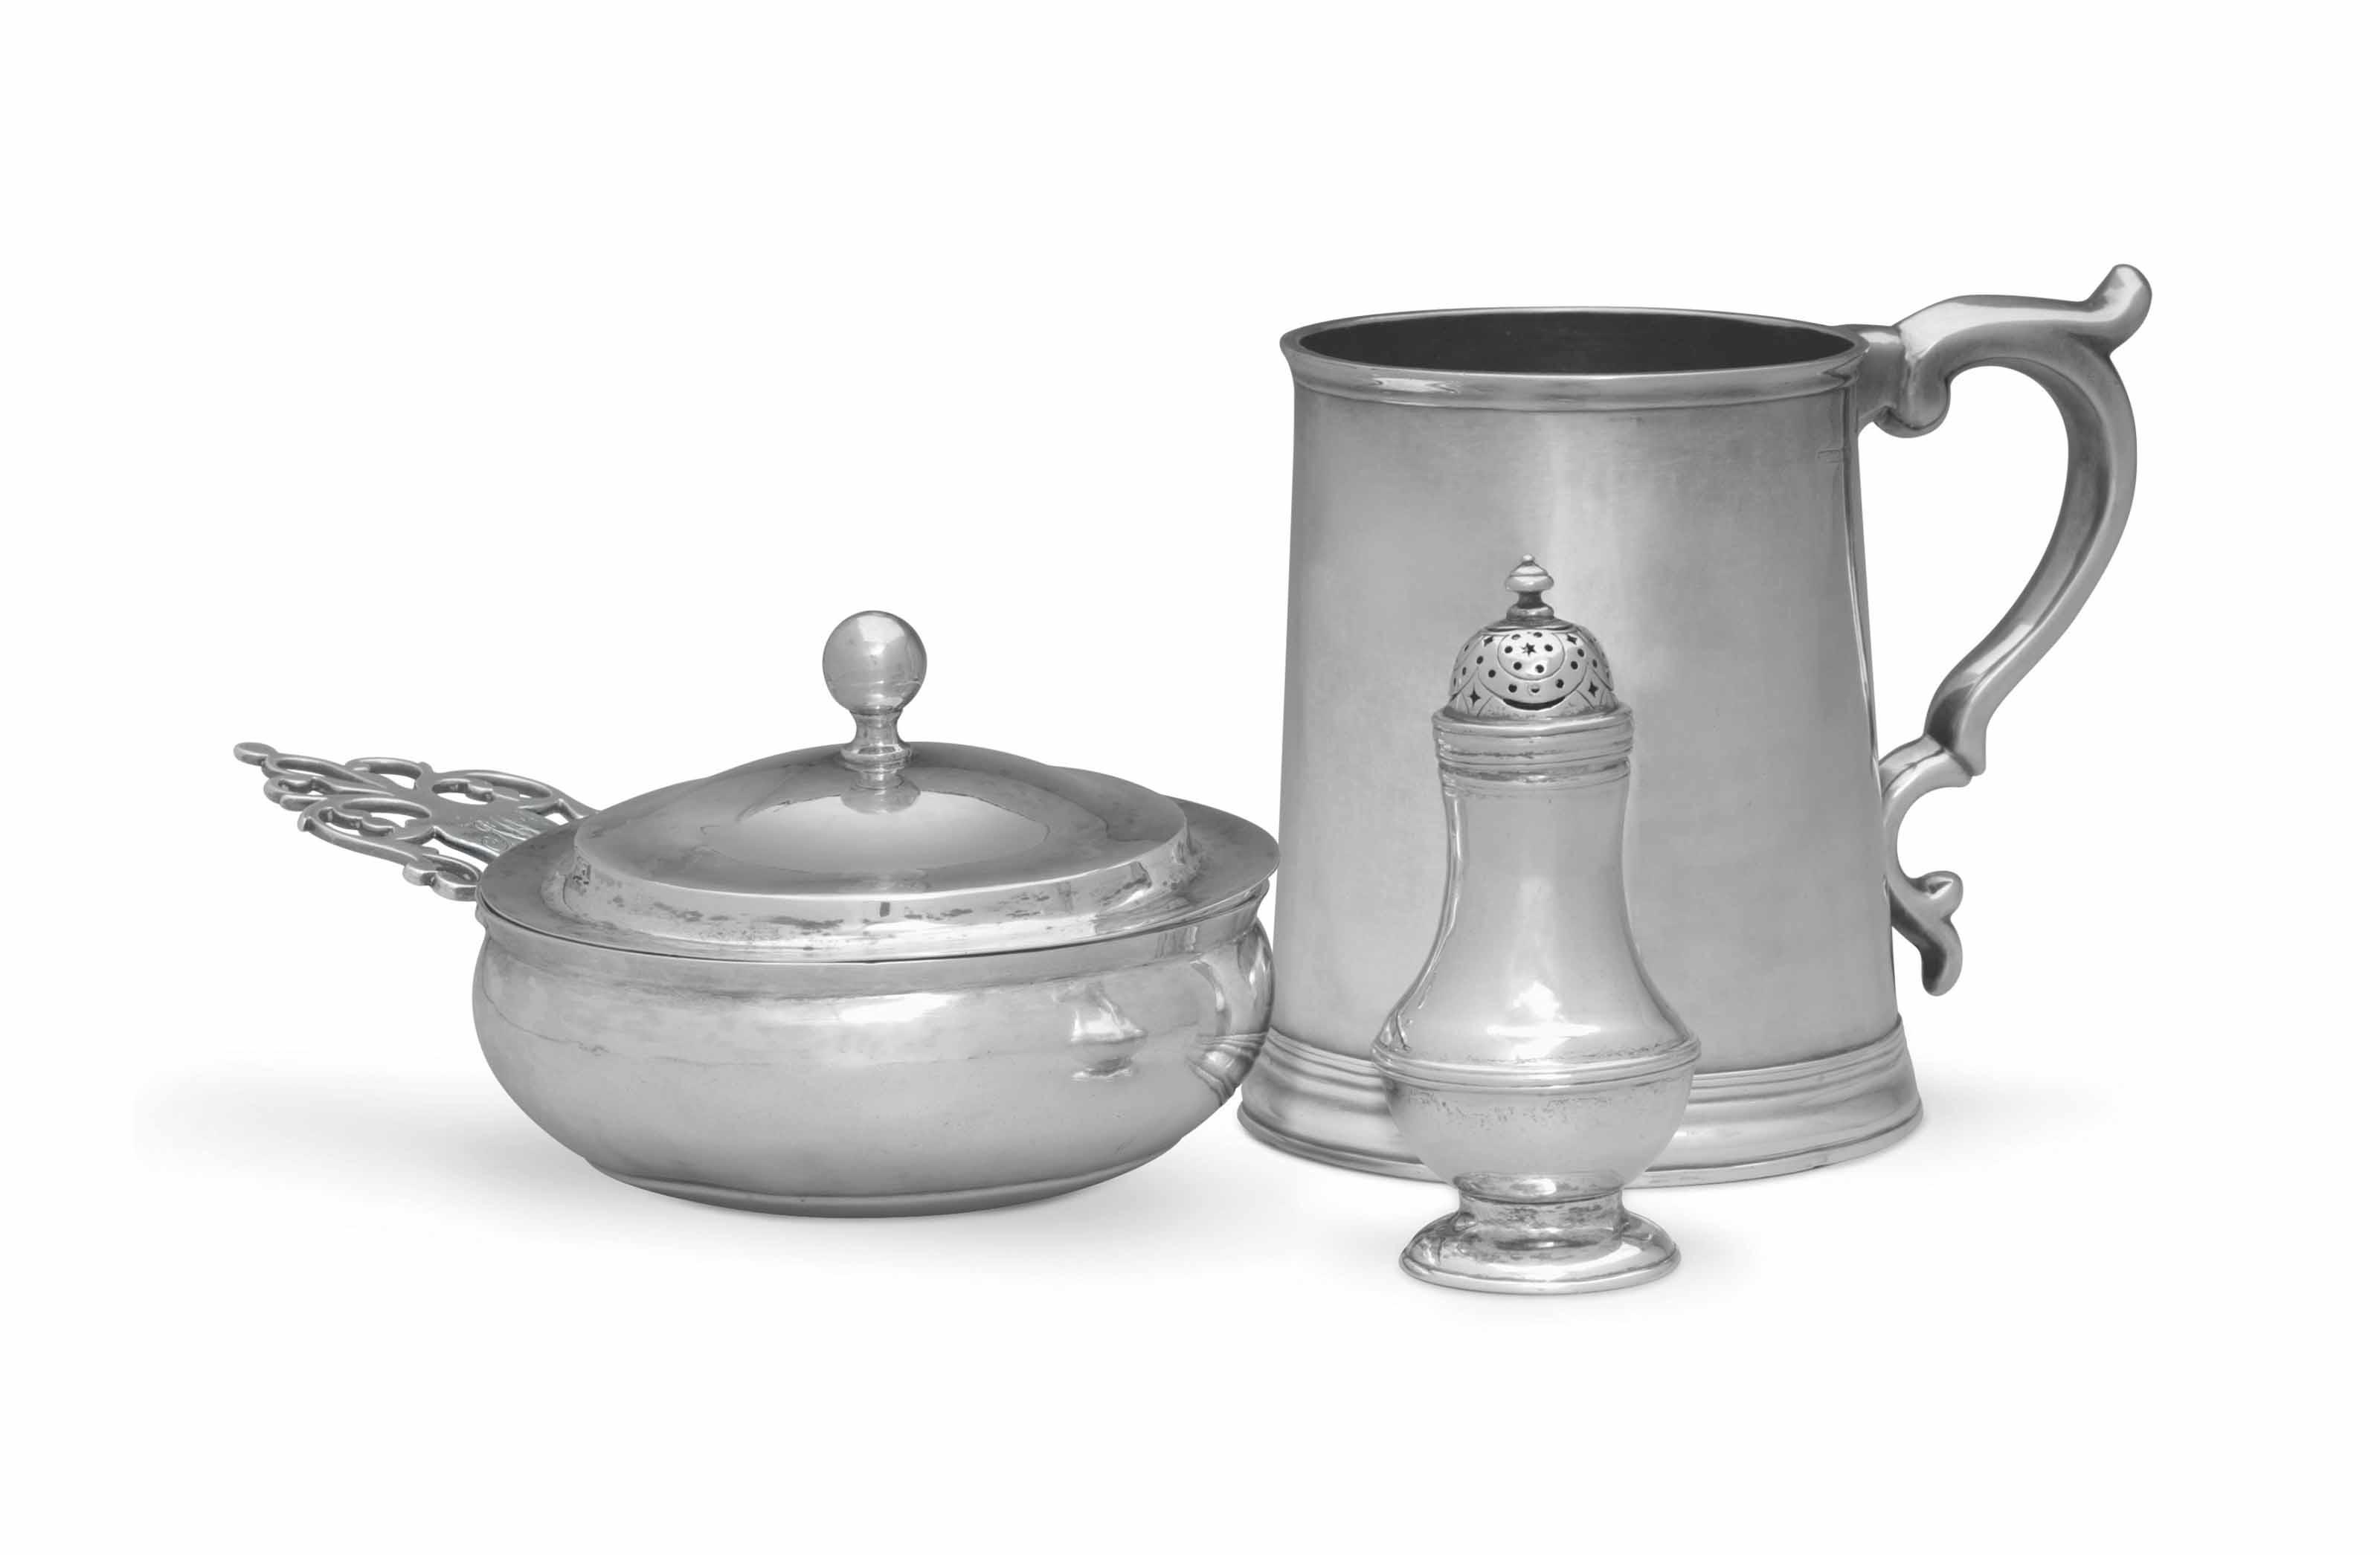 A SILVER QUART CANN, PORRINGER AND CASTER